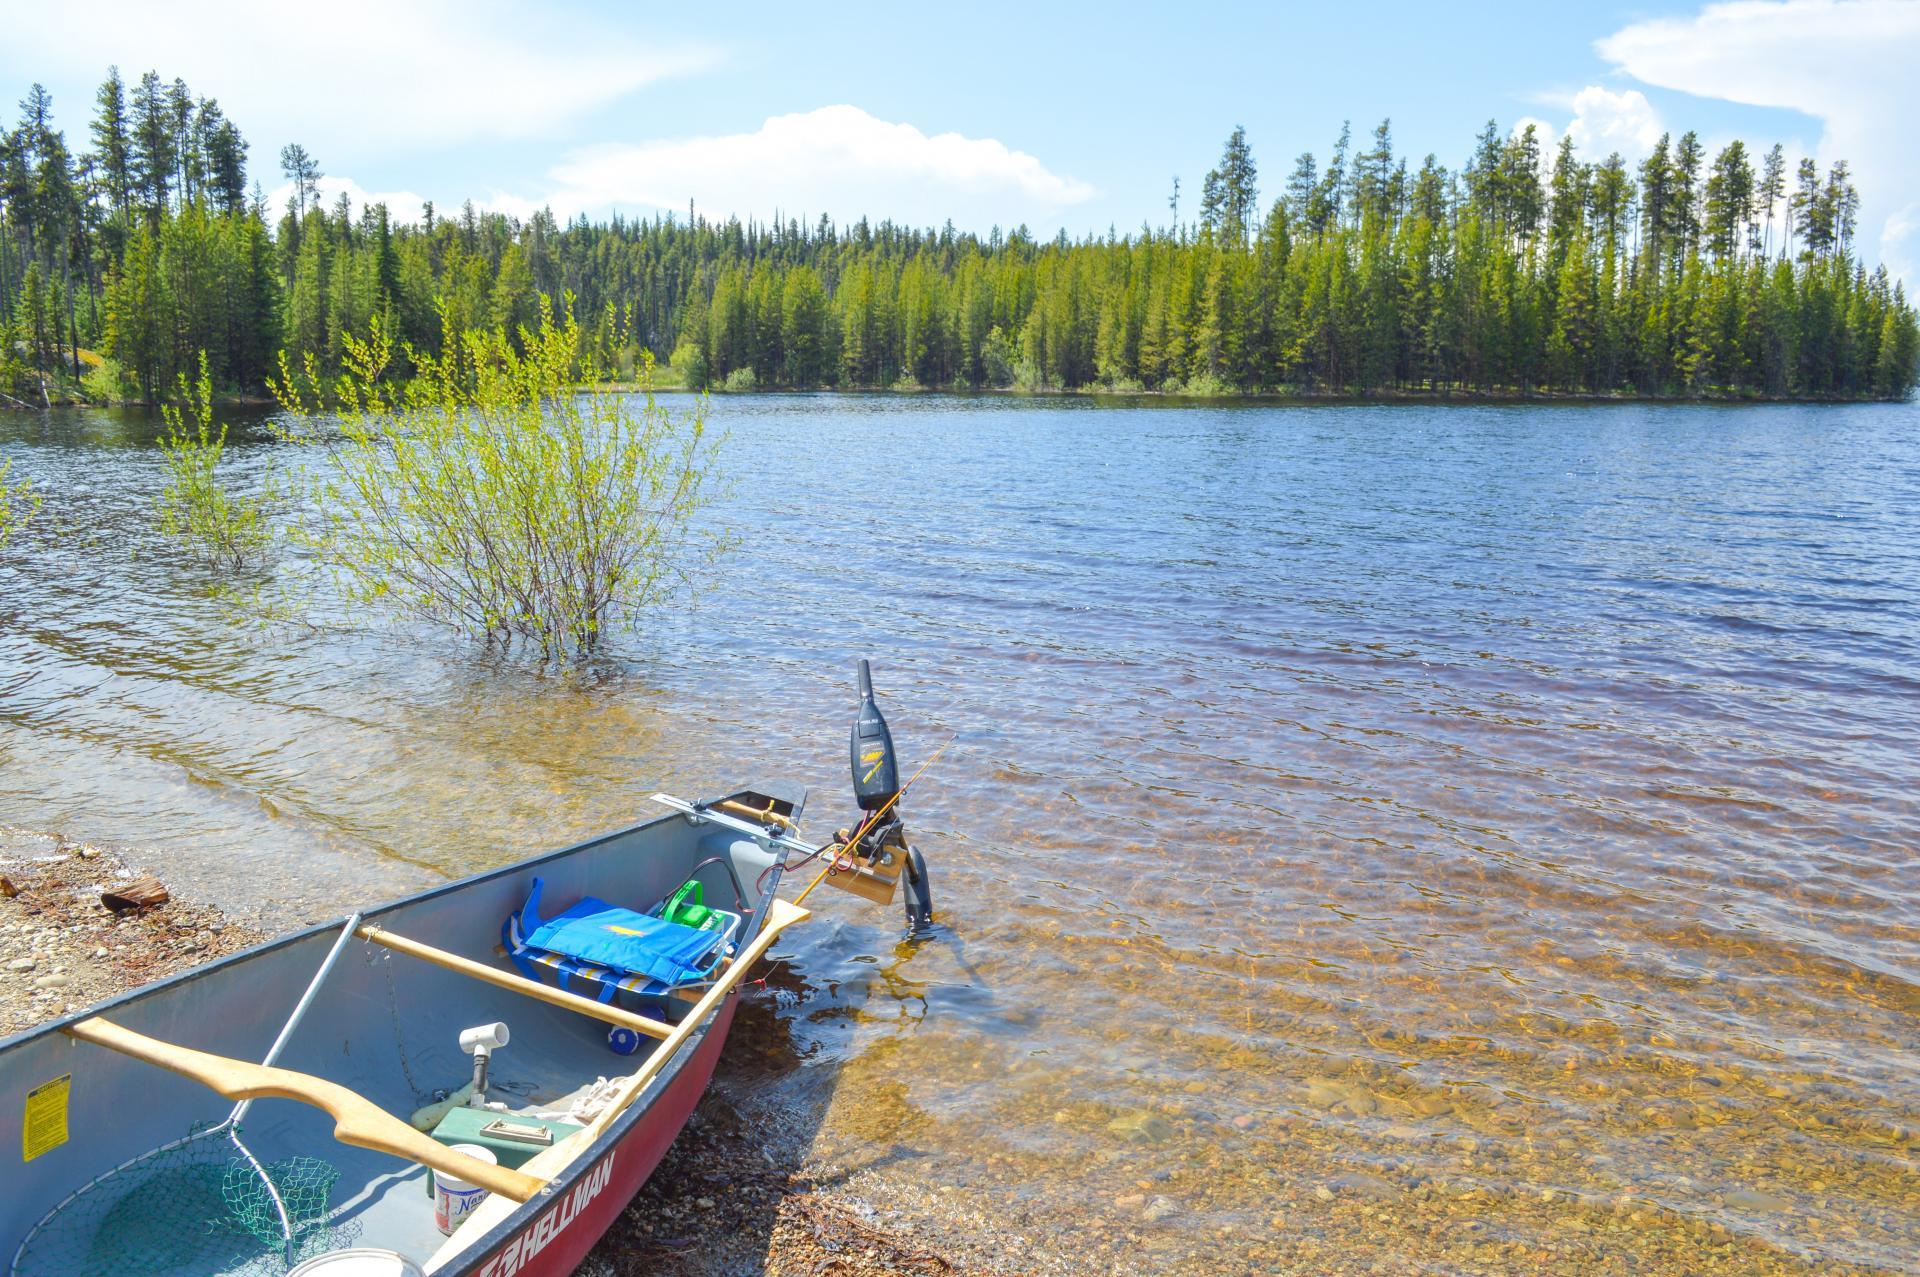 Fishing in the Okanagan